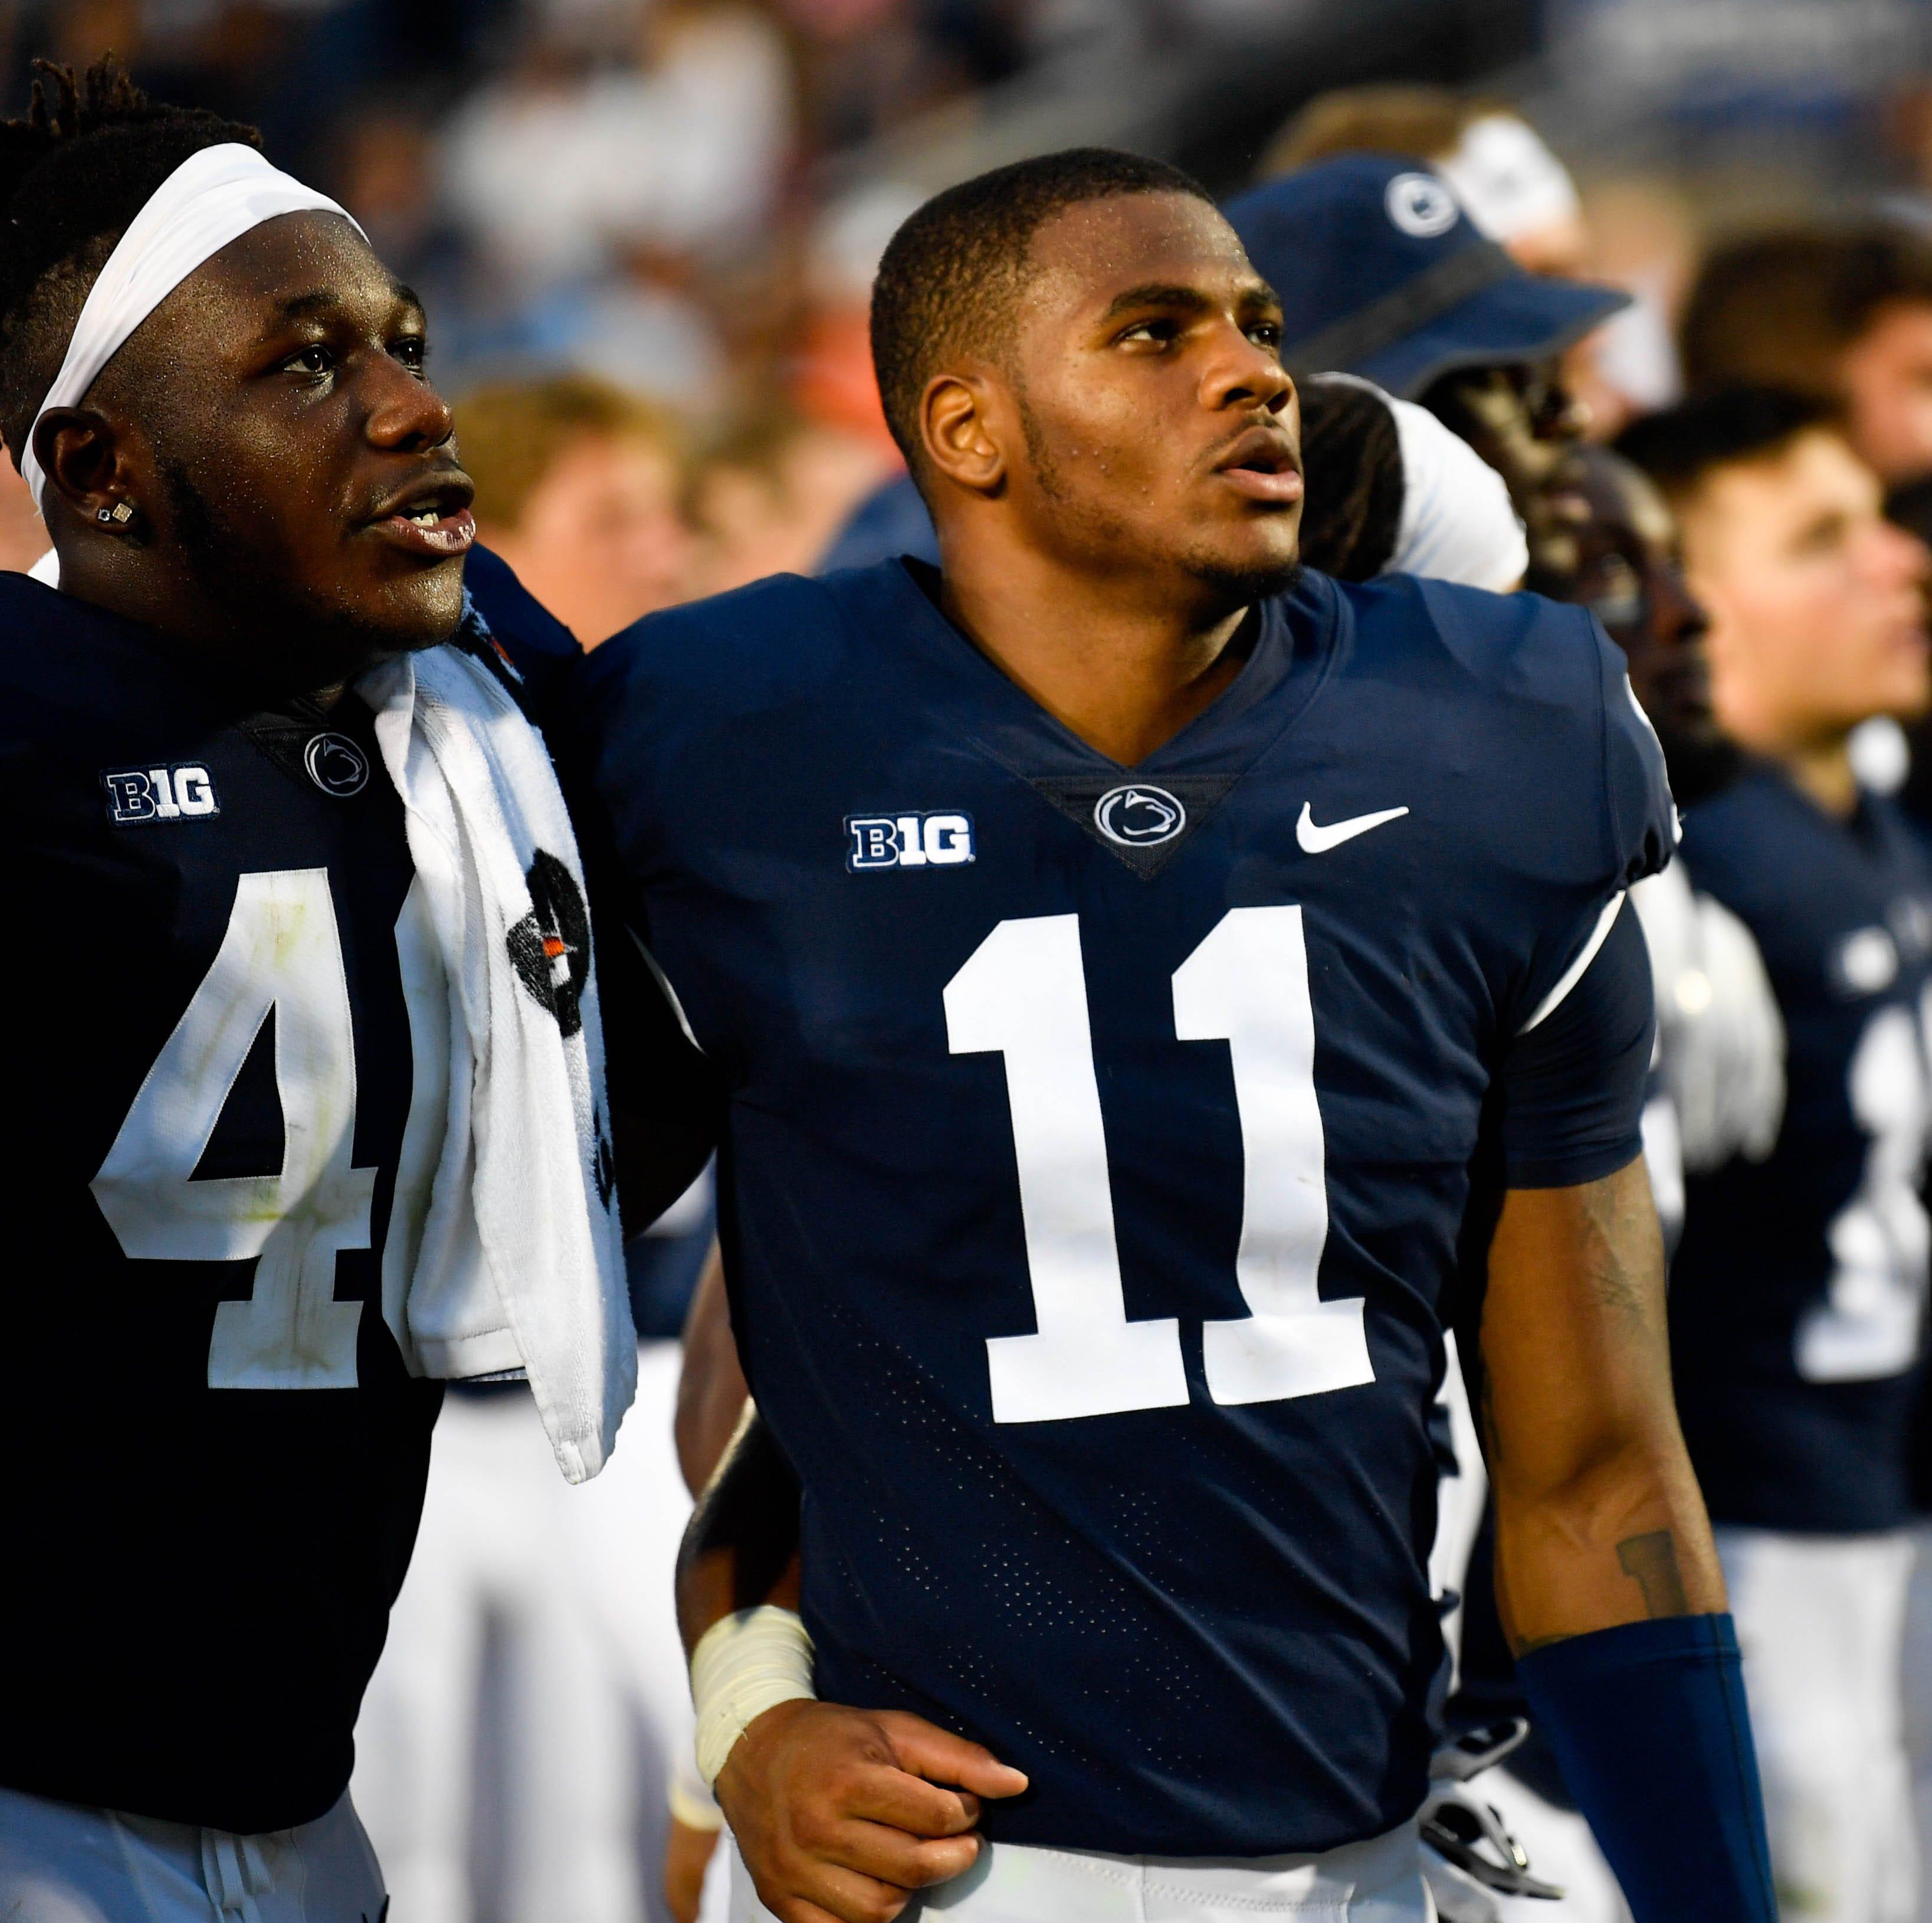 Micah Parsons watch: Penn State linebacker grows up while blasting Pitt